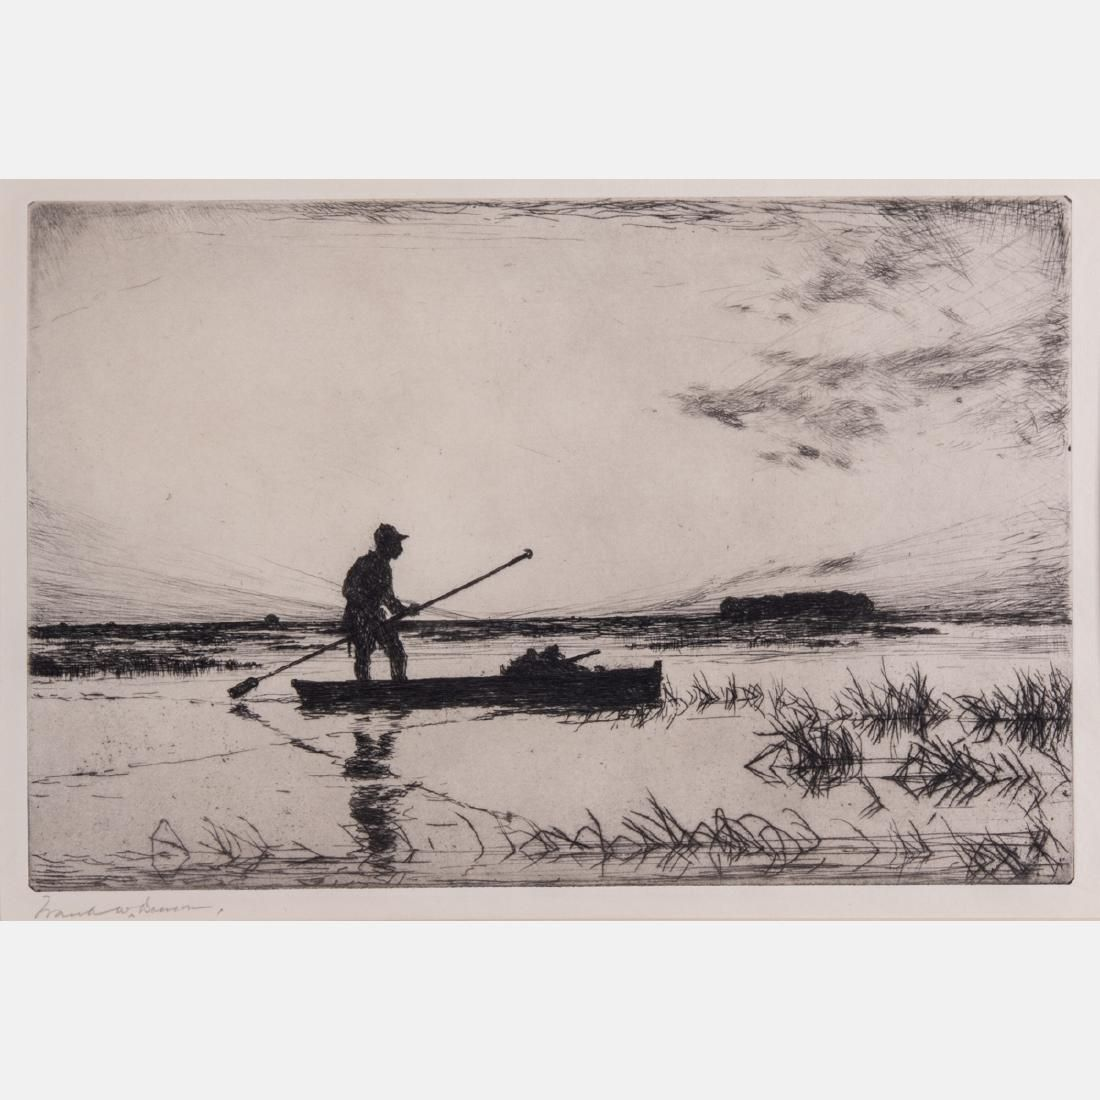 Frank Weston Benson (1862-1951) The Punter, 1927,